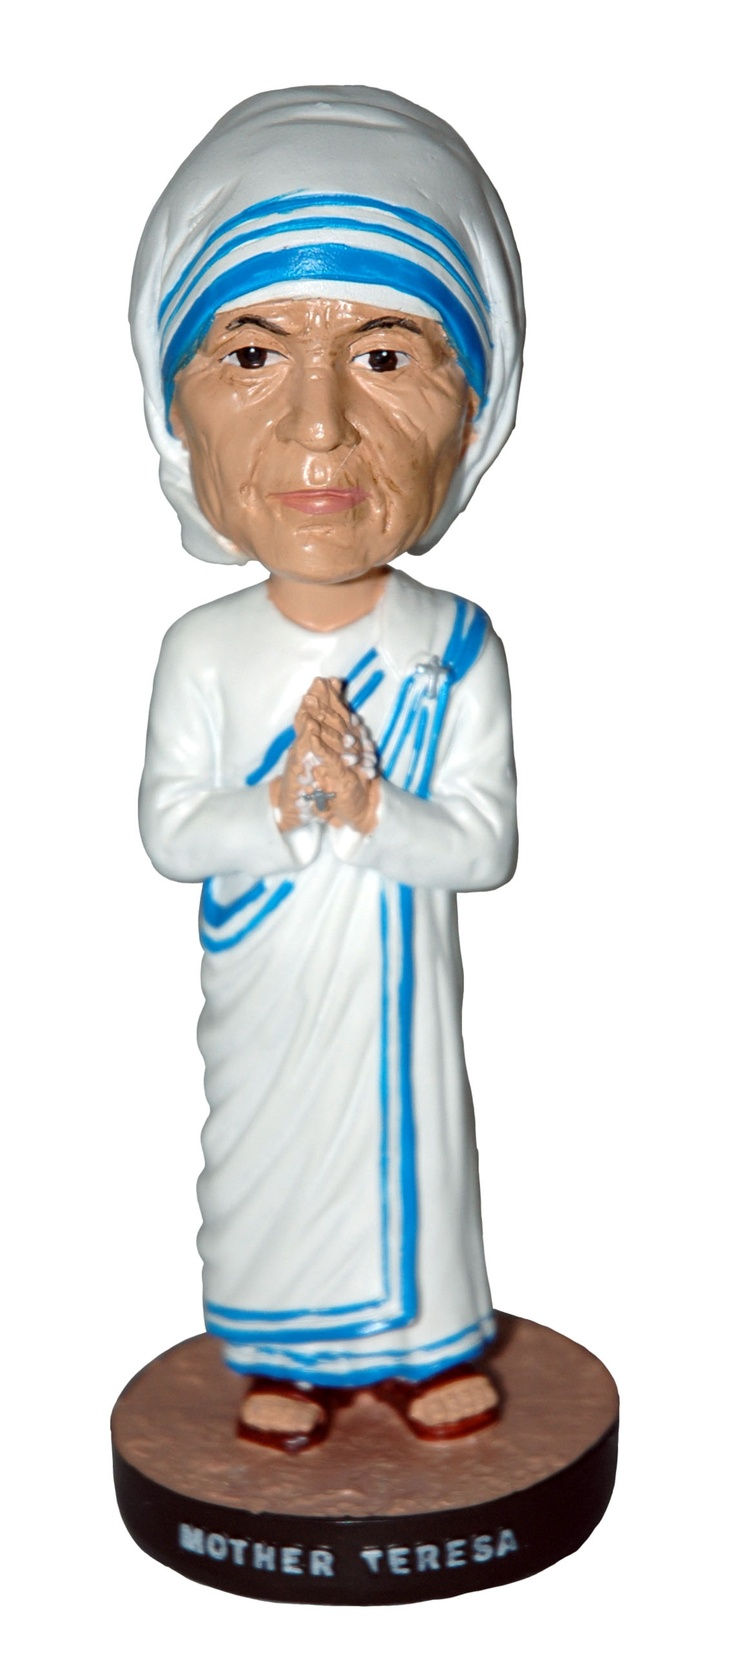 Mother Teresa Of Calcutta Bobblehead Figurine Founder Of